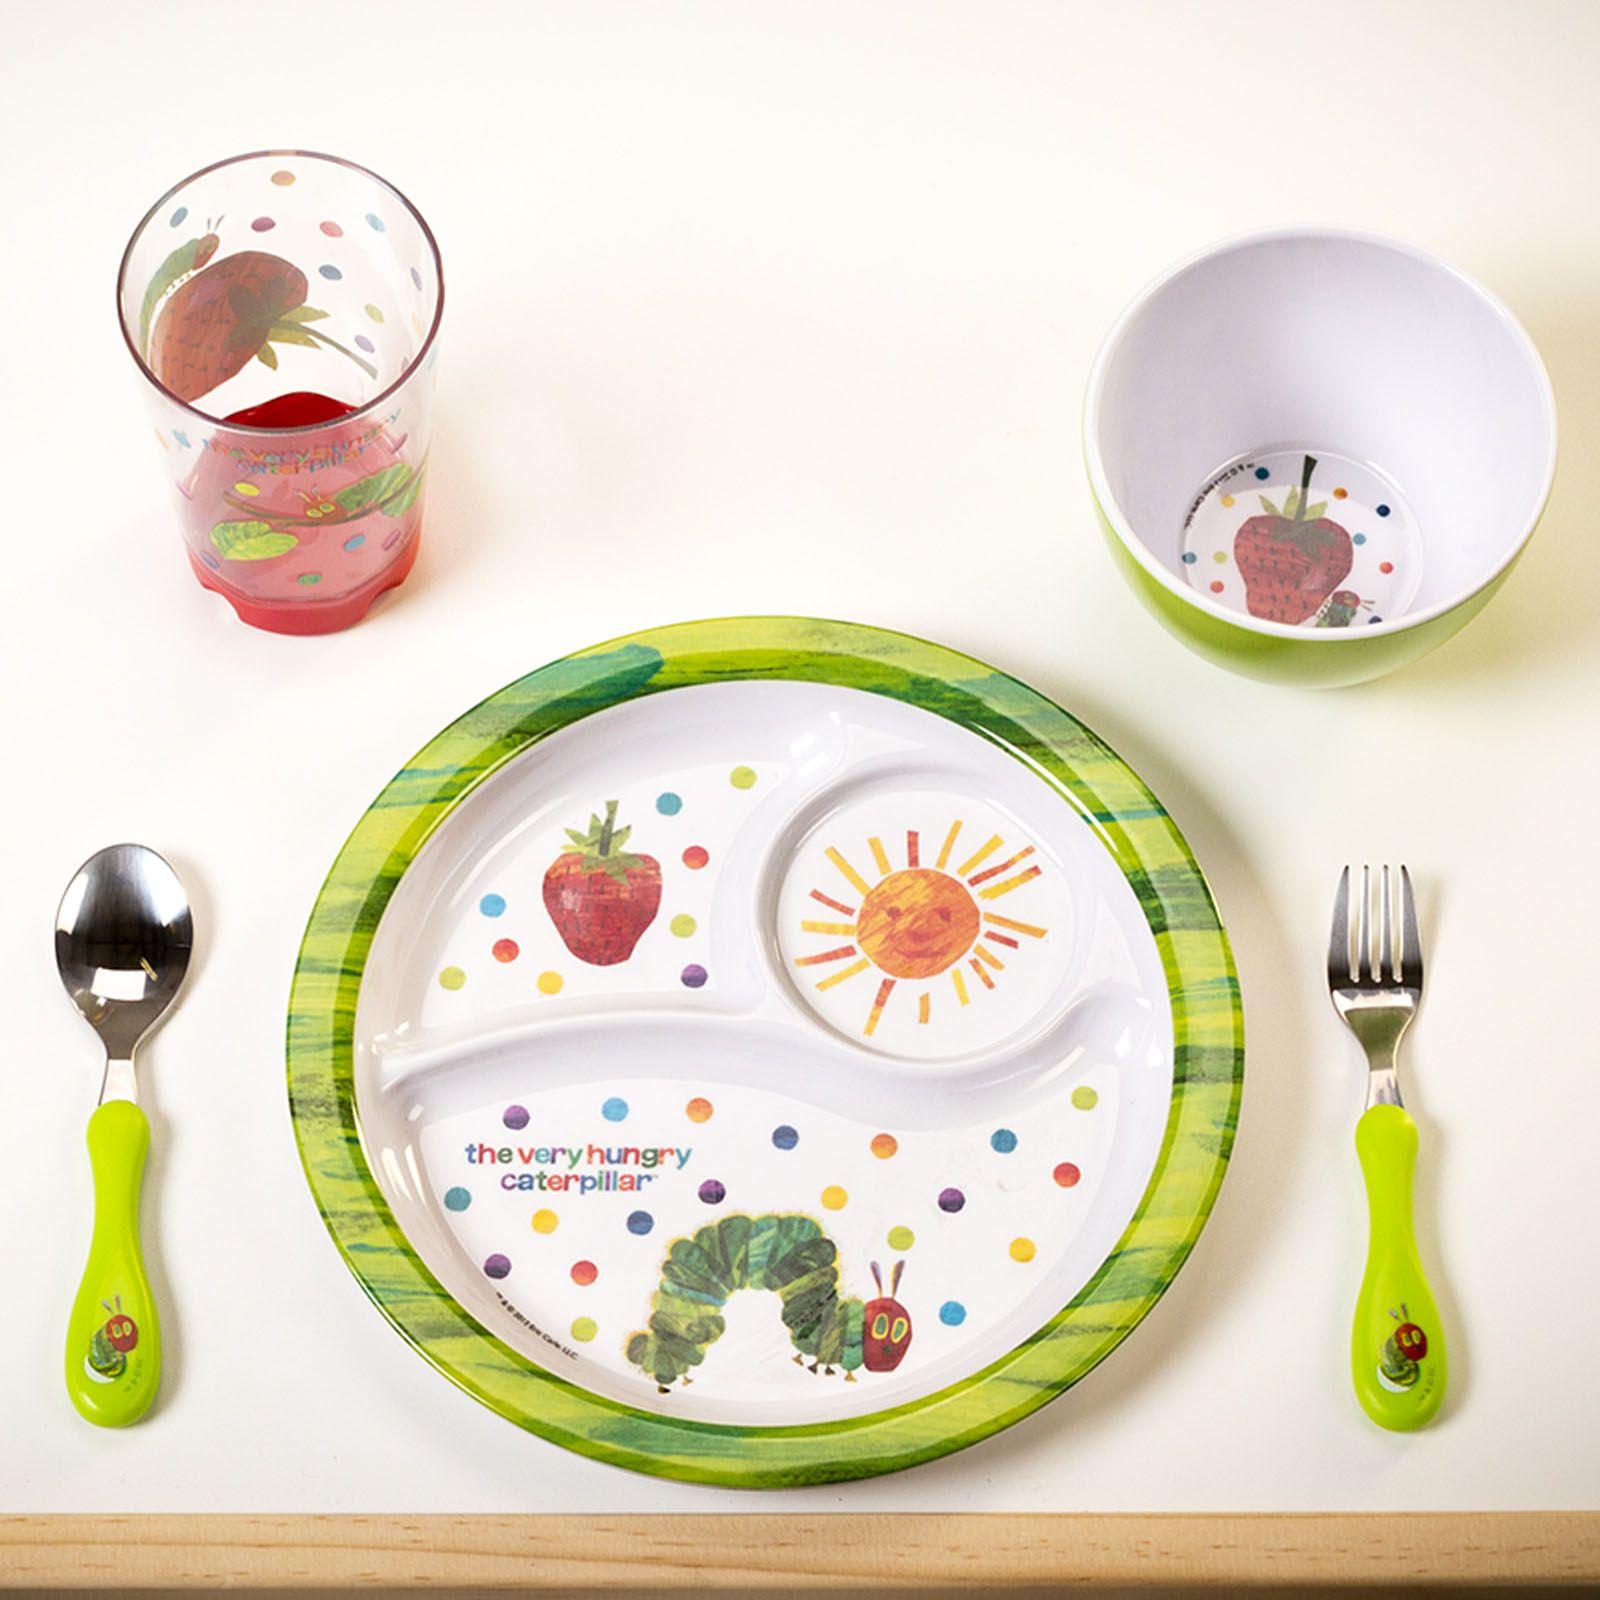 Hungry Caterpillar Plates - Best Plate 2018